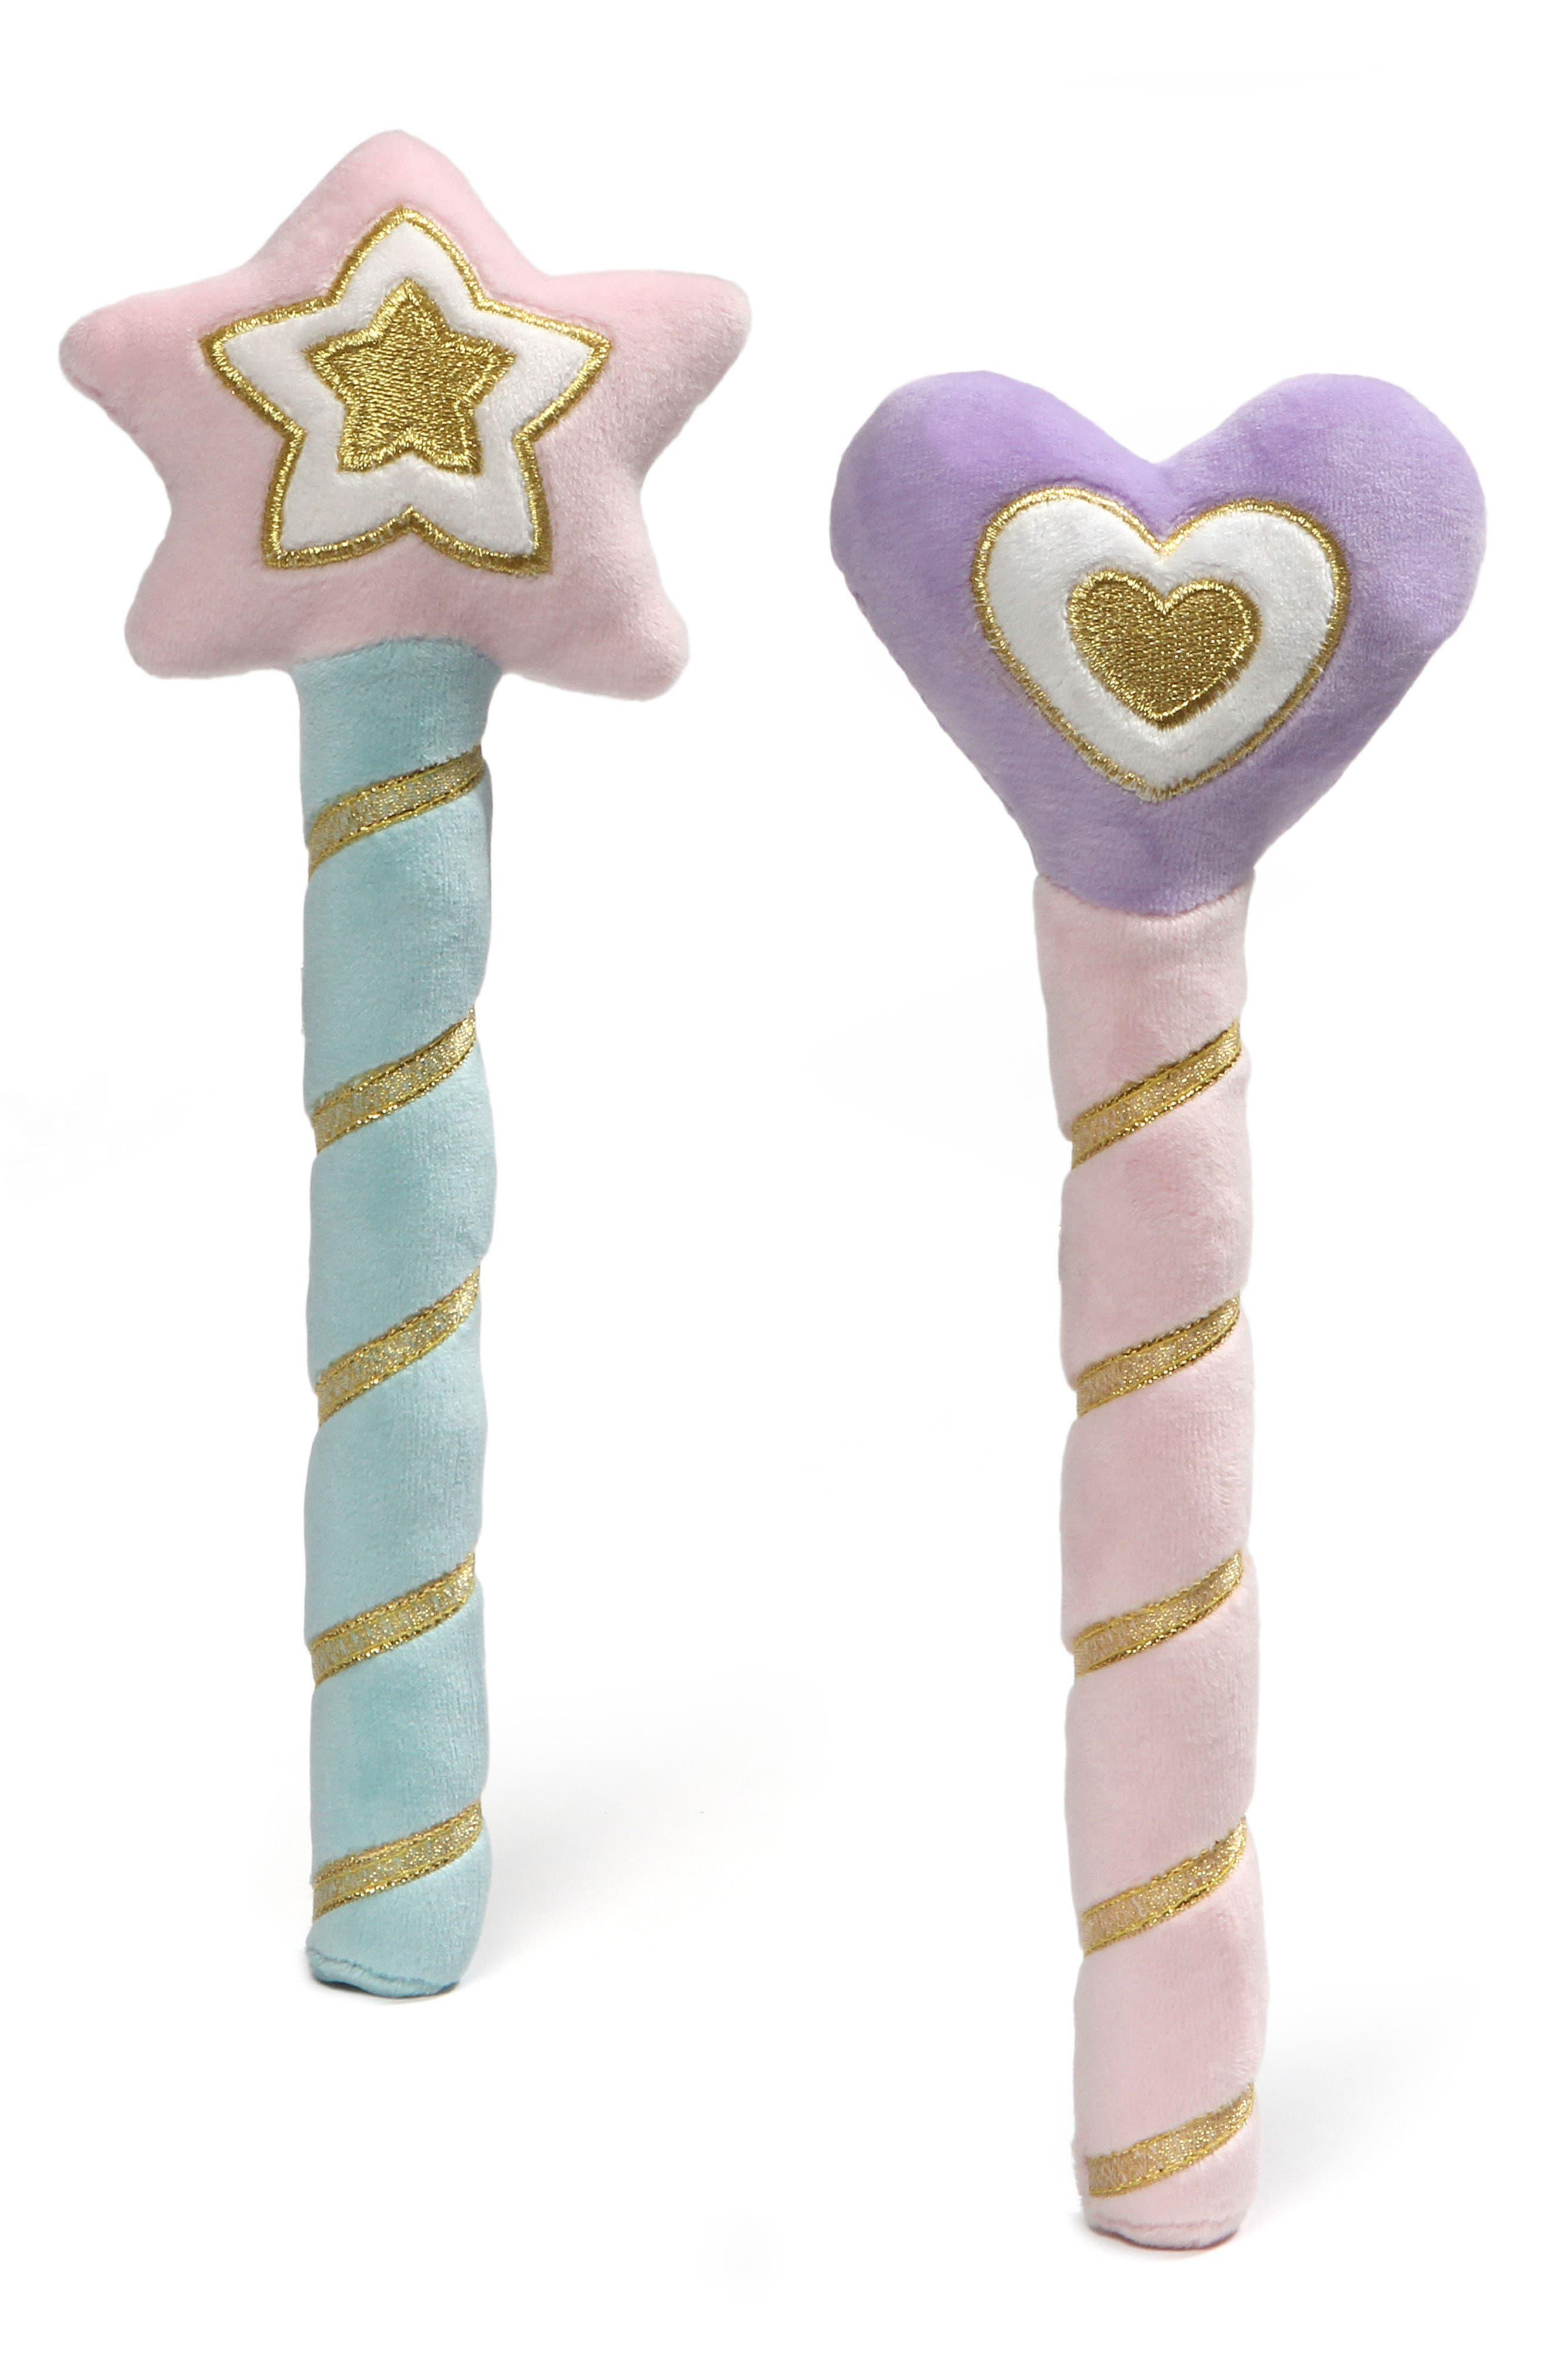 Gund Magical Wand Plush Toy